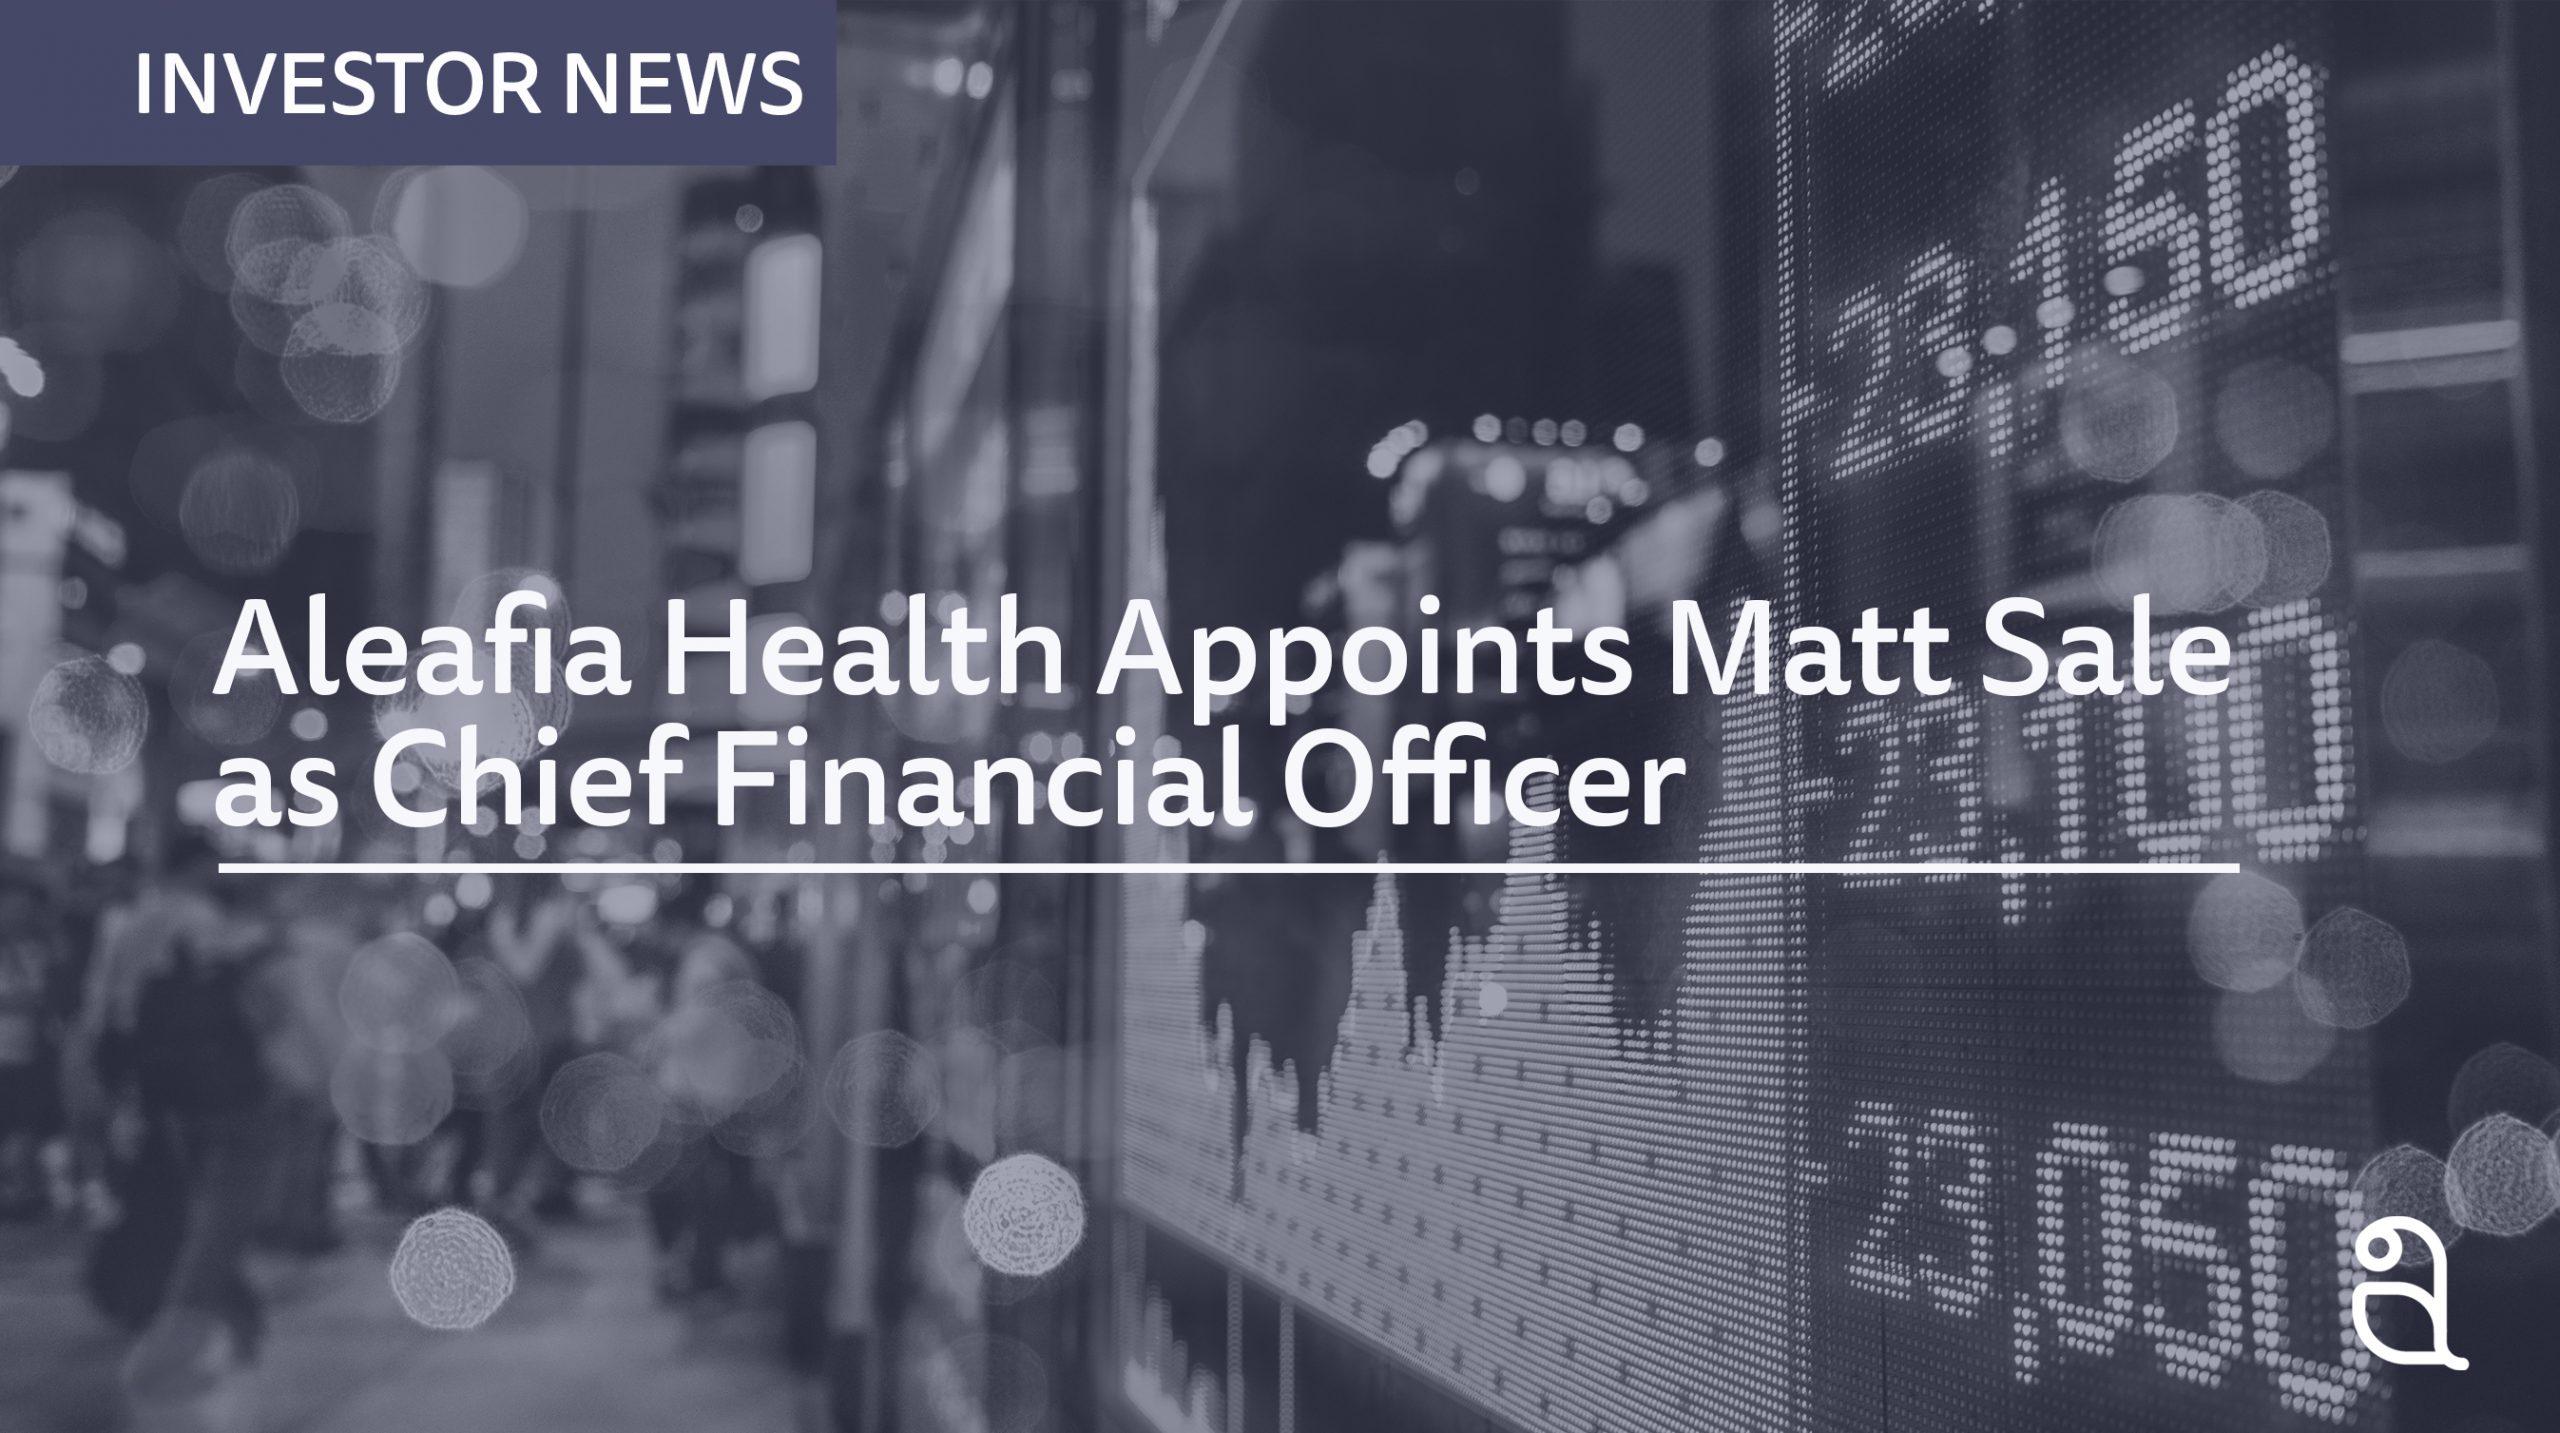 Aleafia Health Appoints Finance Executive Matt Sale as Chief Financial Officer